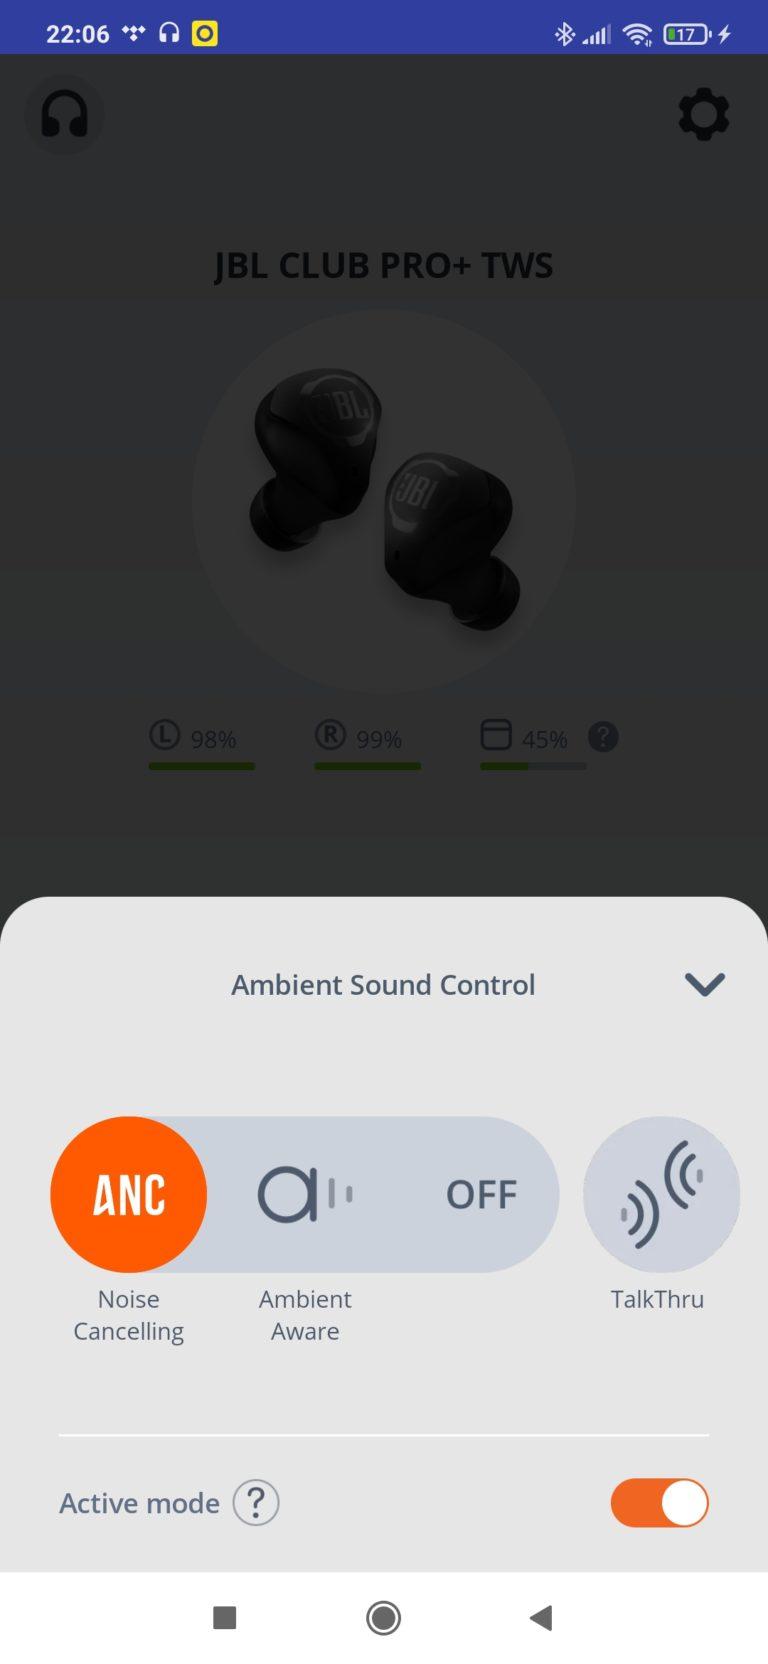 ANC w aplikacji JBL my headphones